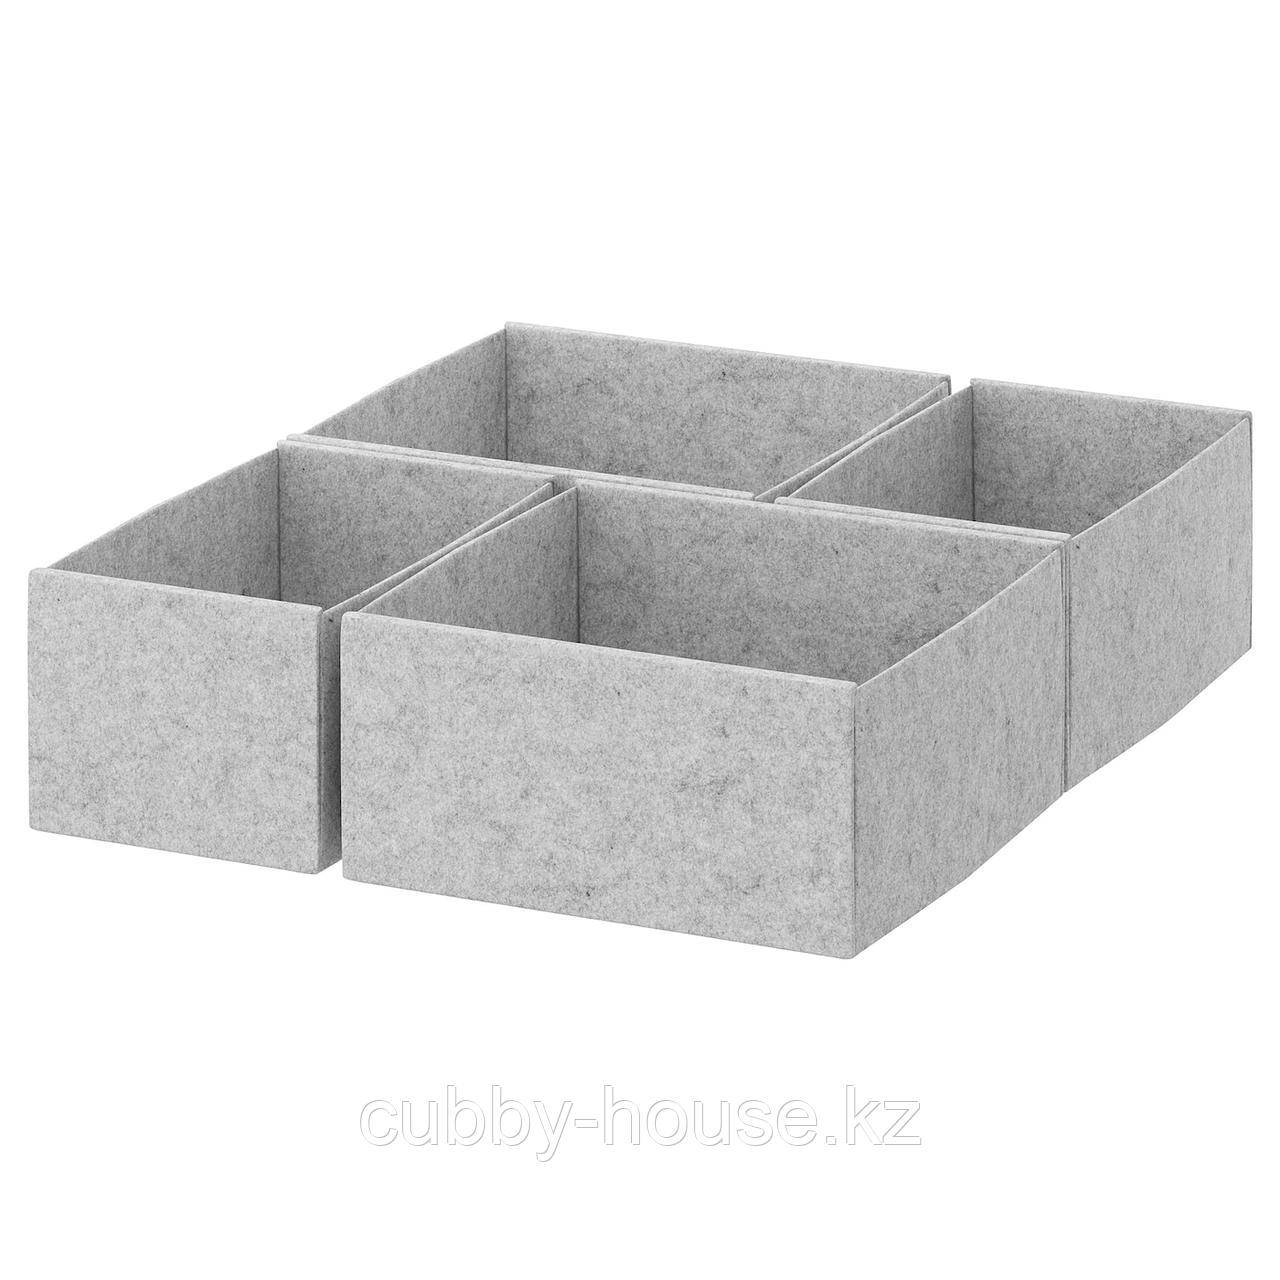 КОМПЛИМЕНТ Коробка, 4 шт., светло-серый, 50x58 см